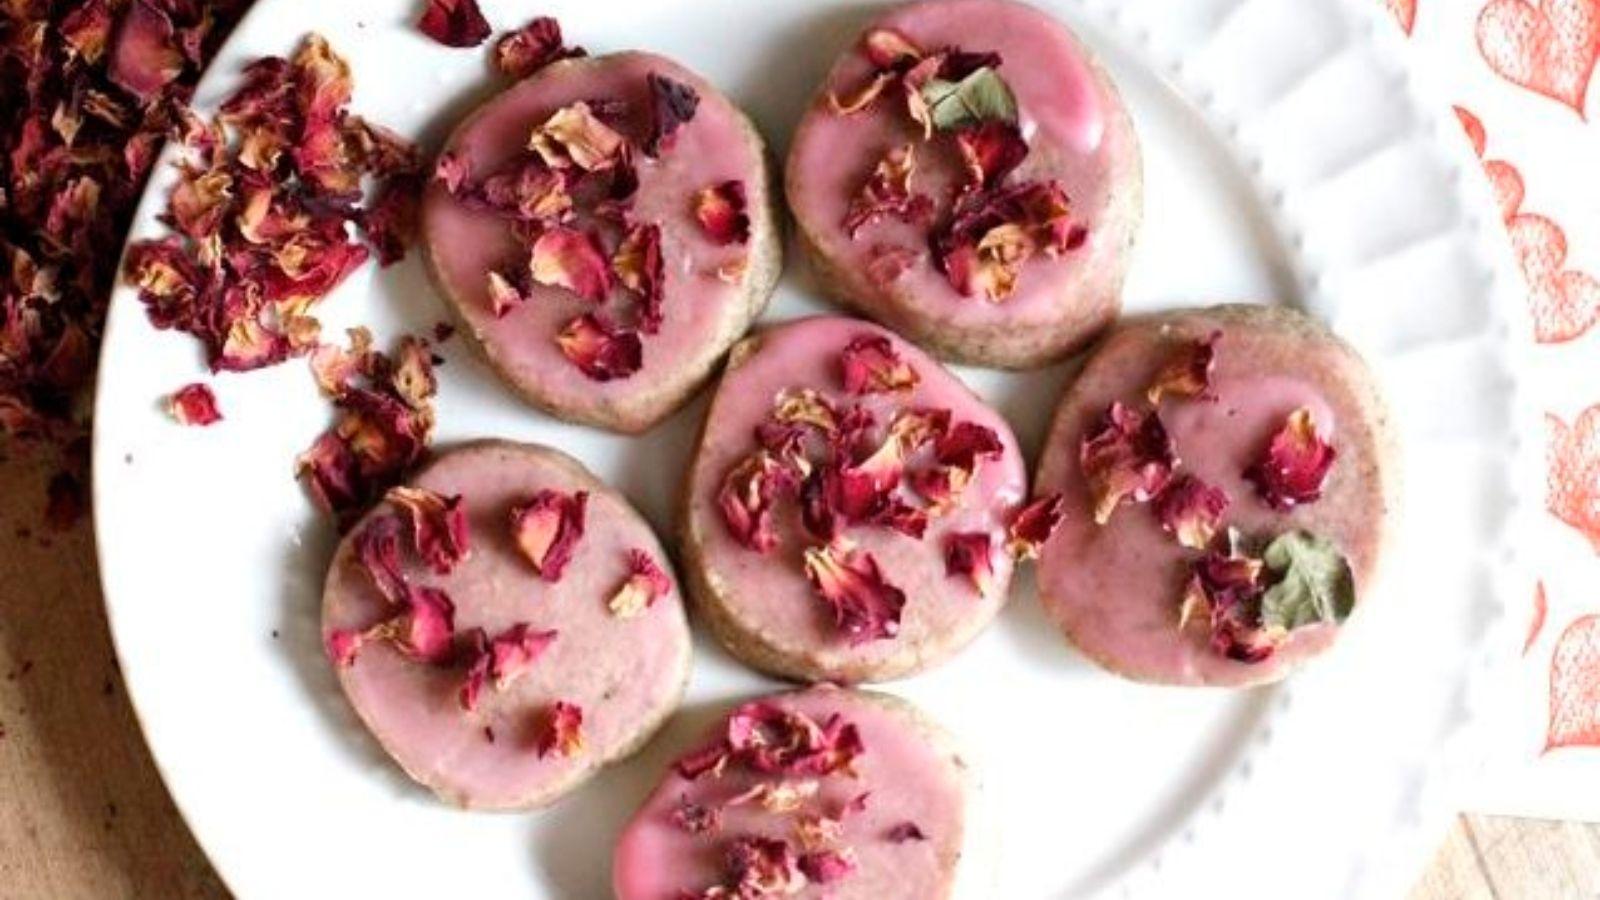 كوكيز بالورد Tea Infusion Recipes Tea Time Food Tea Infuser